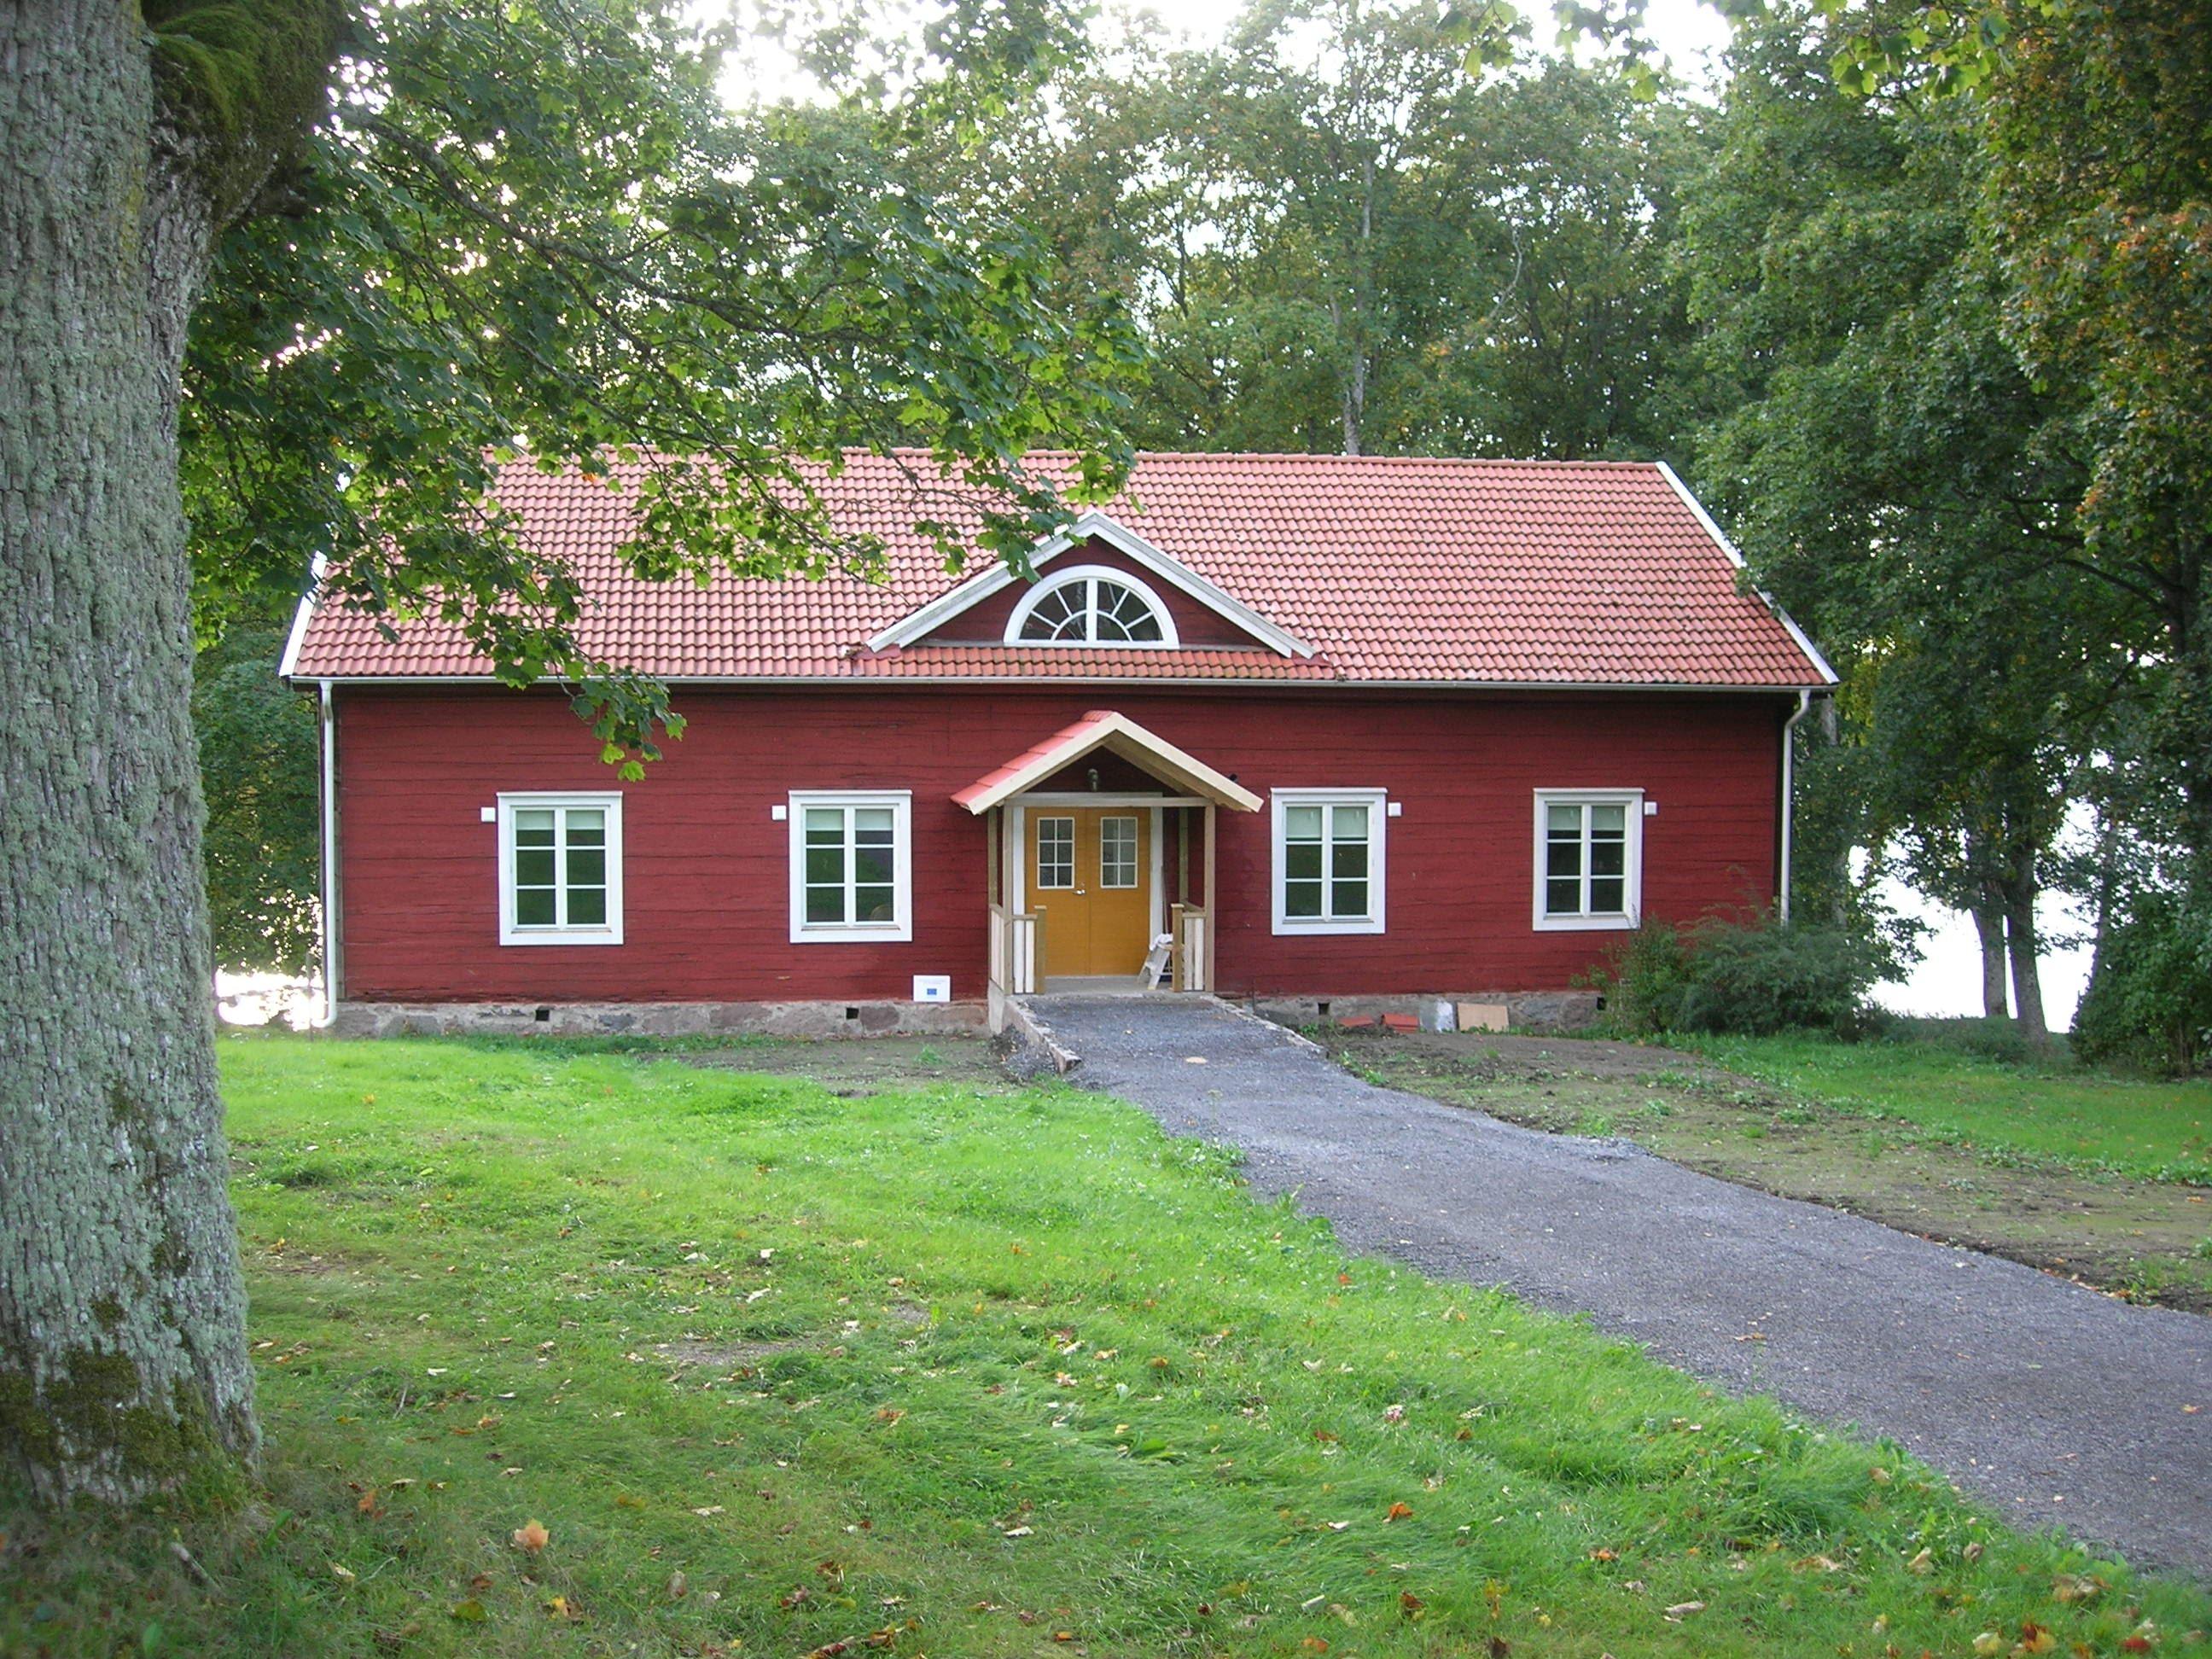 Kråkenäs manor